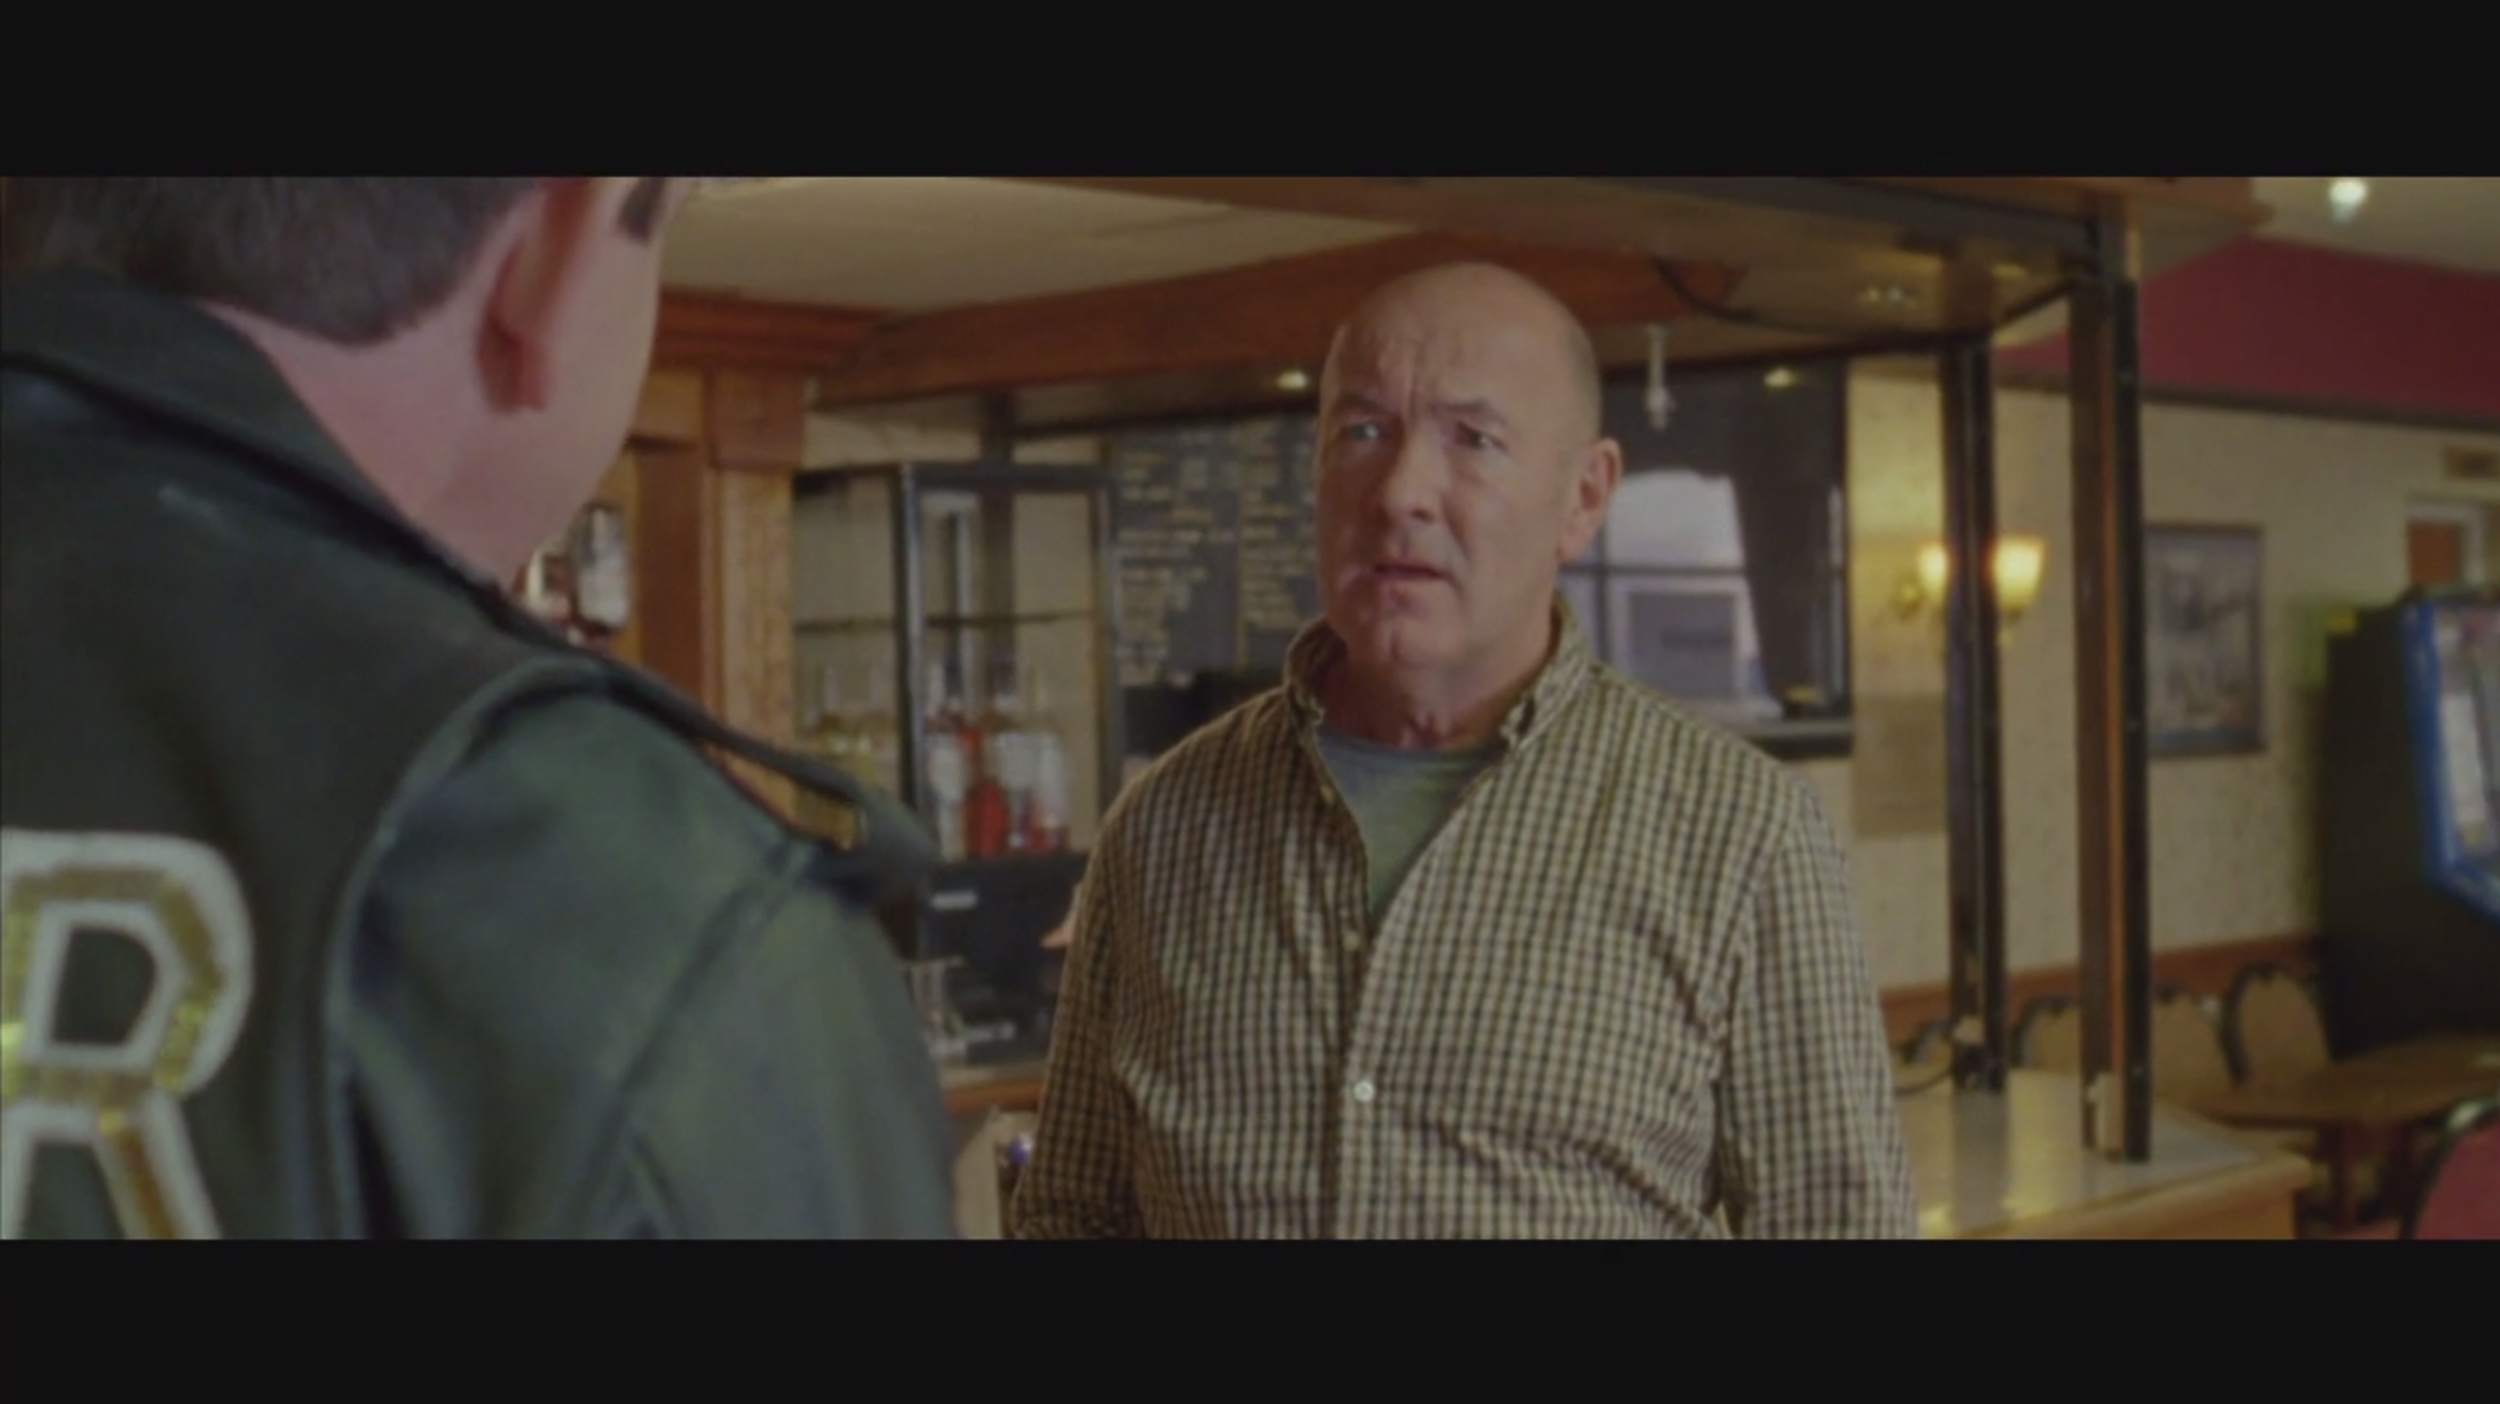 Screen grabs from short film 'Barry Glitter'